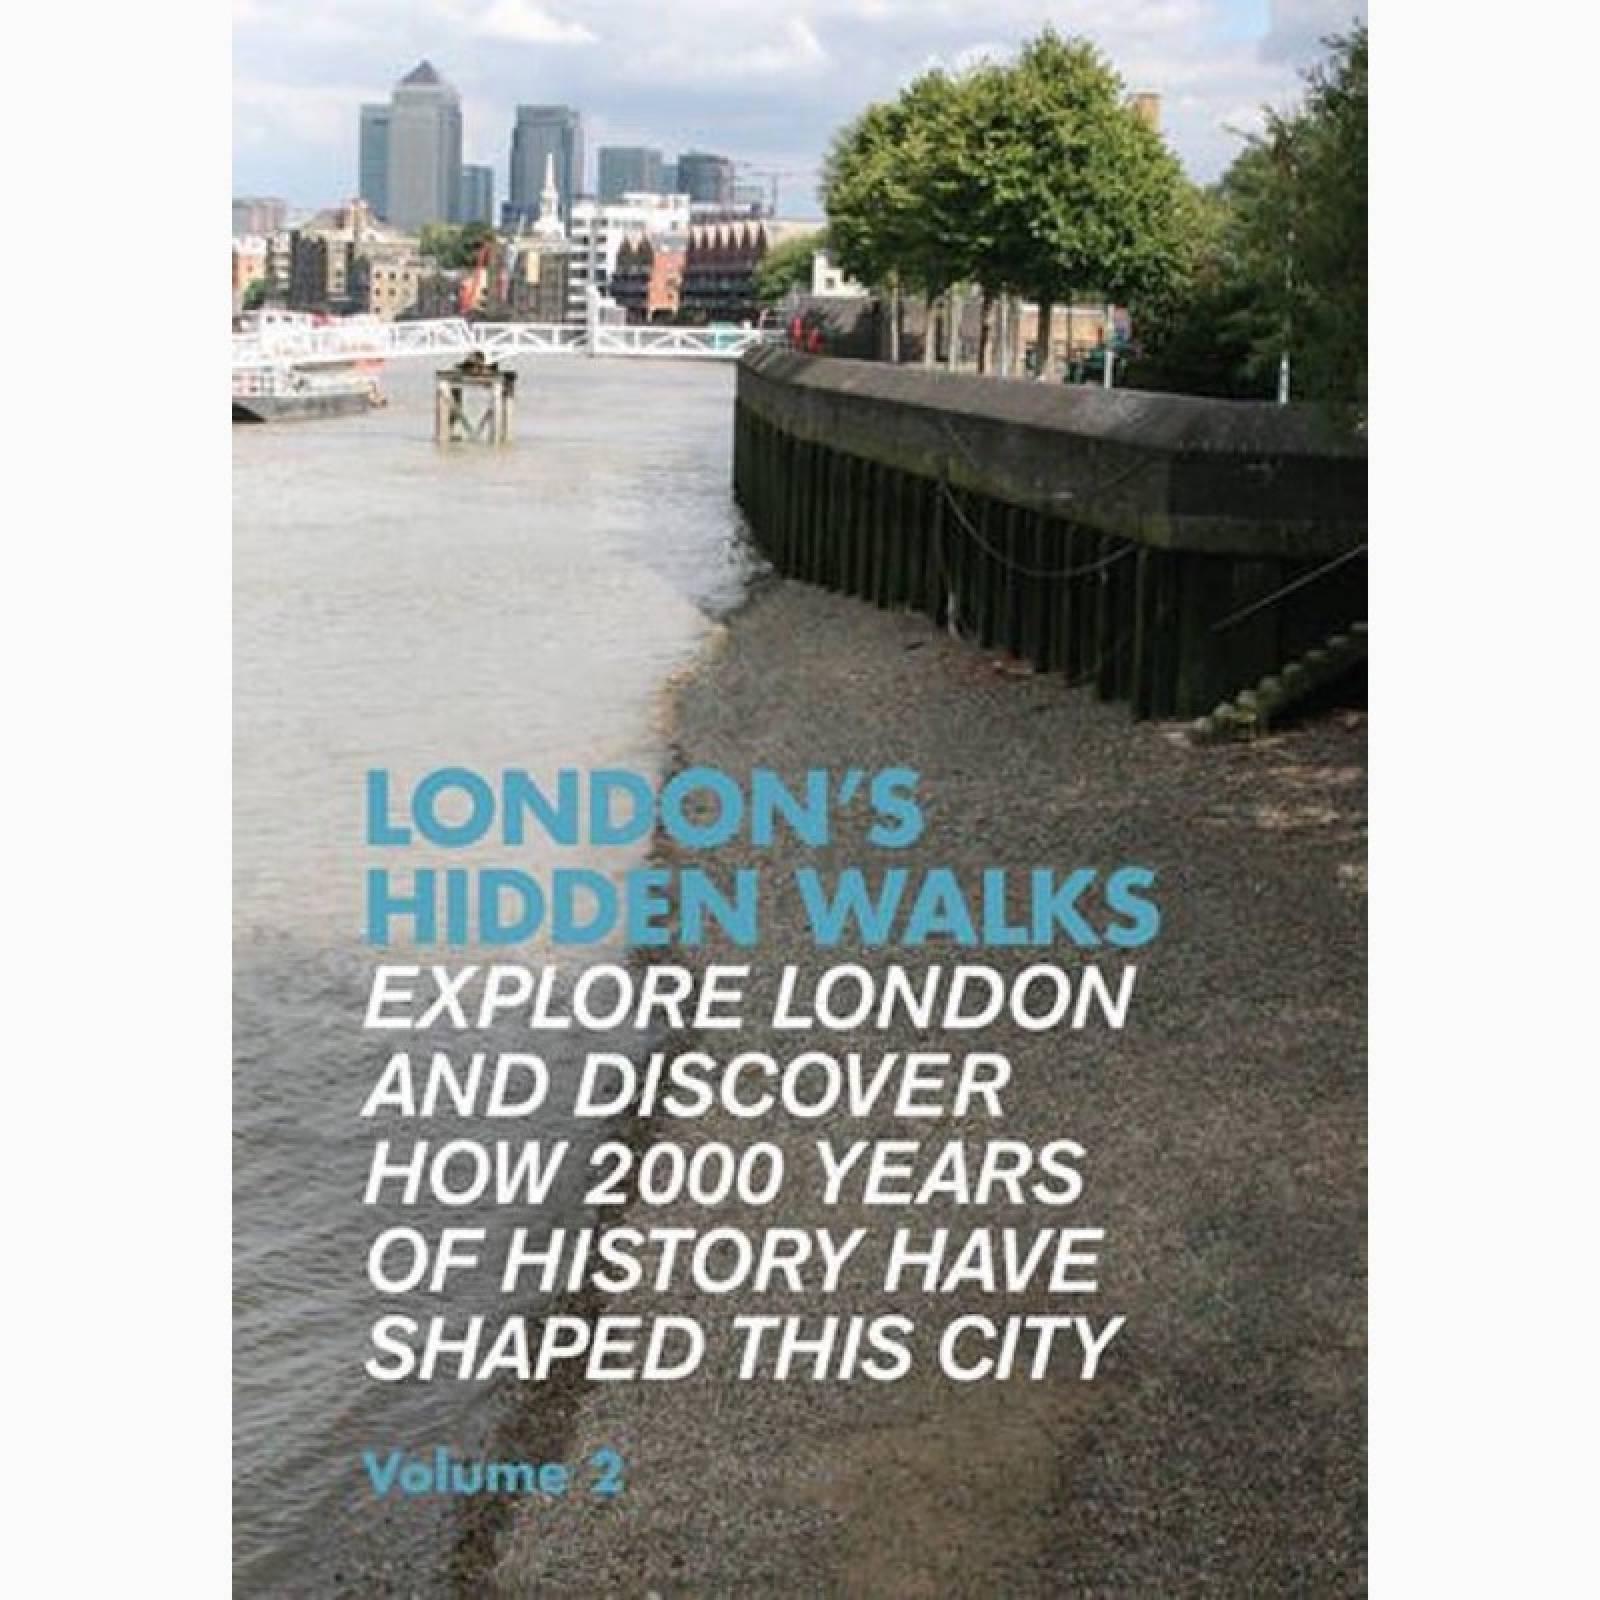 London's Hidden Walks Vol. 2 - Paperback Book